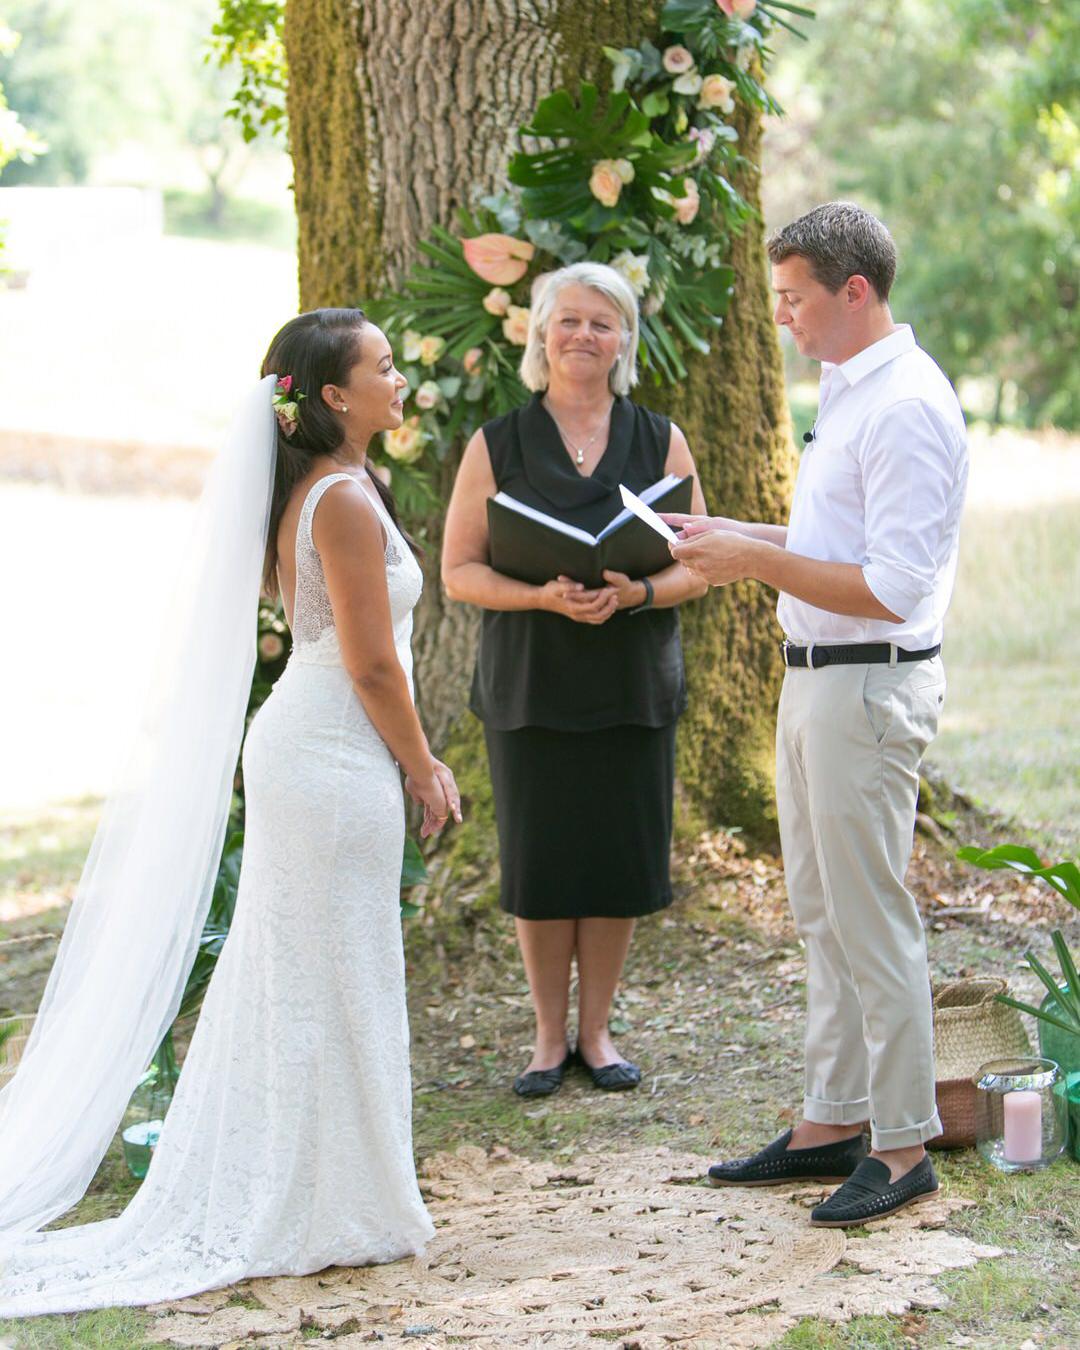 jen tim wedding ceremony in front of tree